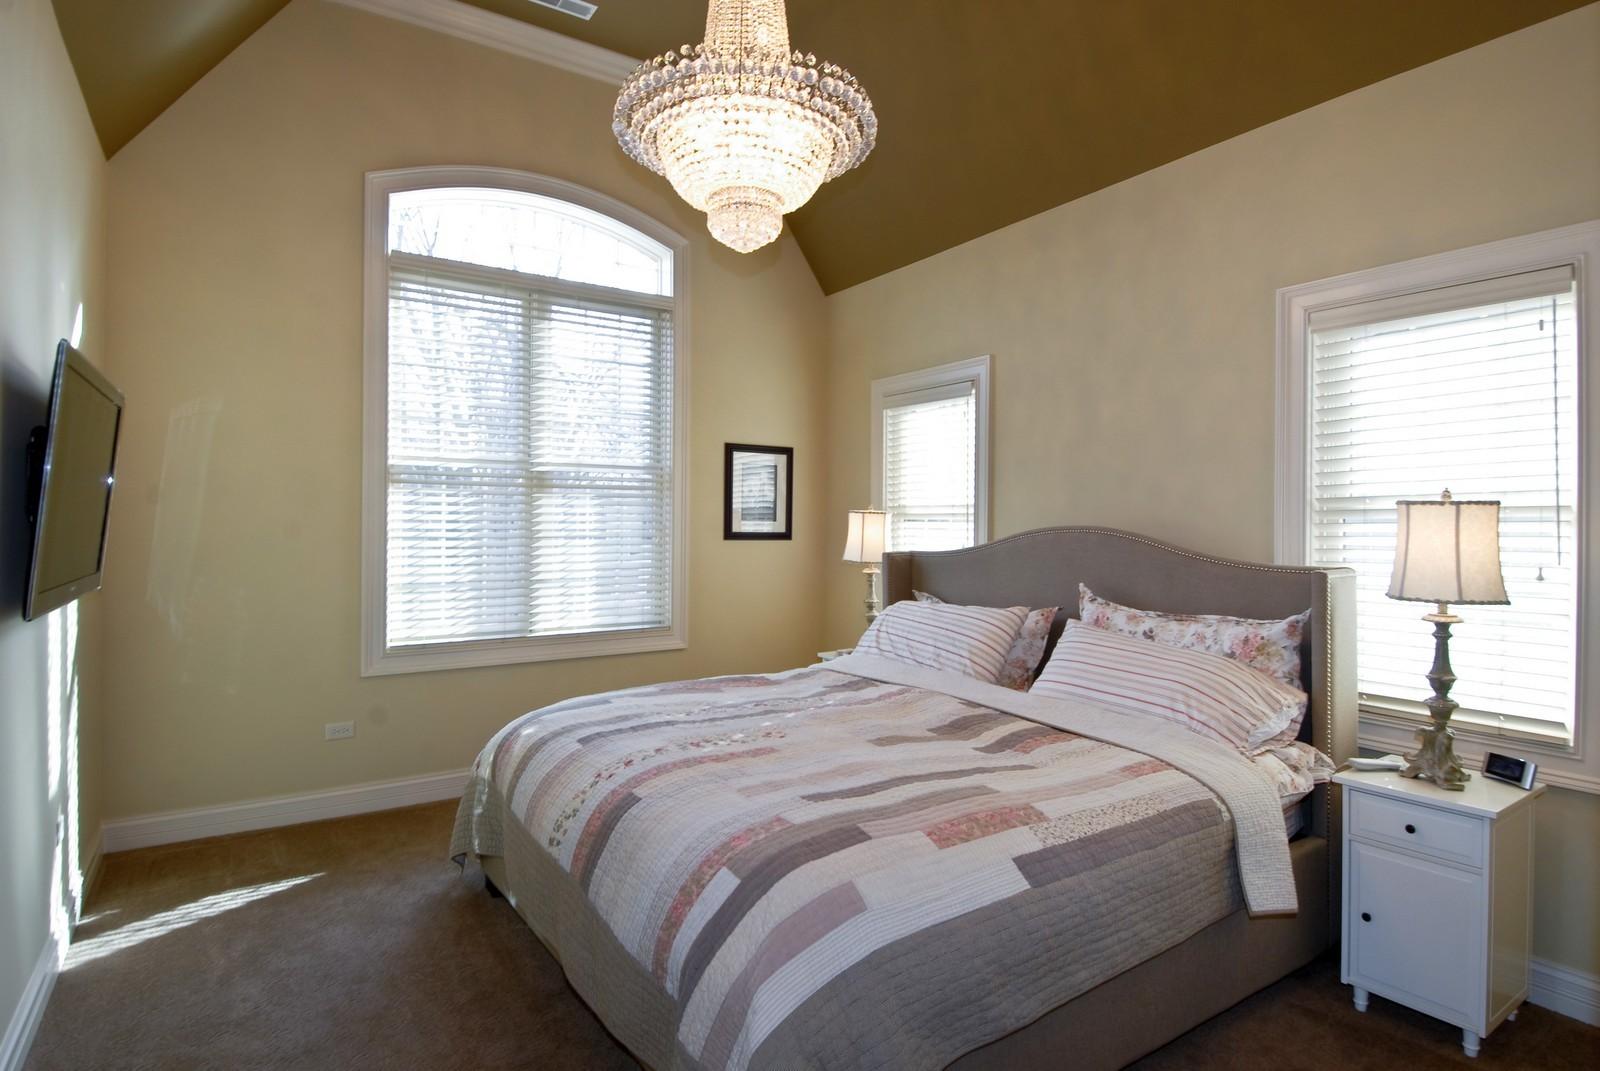 Real Estate Photography - 729 Wellner Dr, Naperville, IL, 60540 - 2nd Bedroom